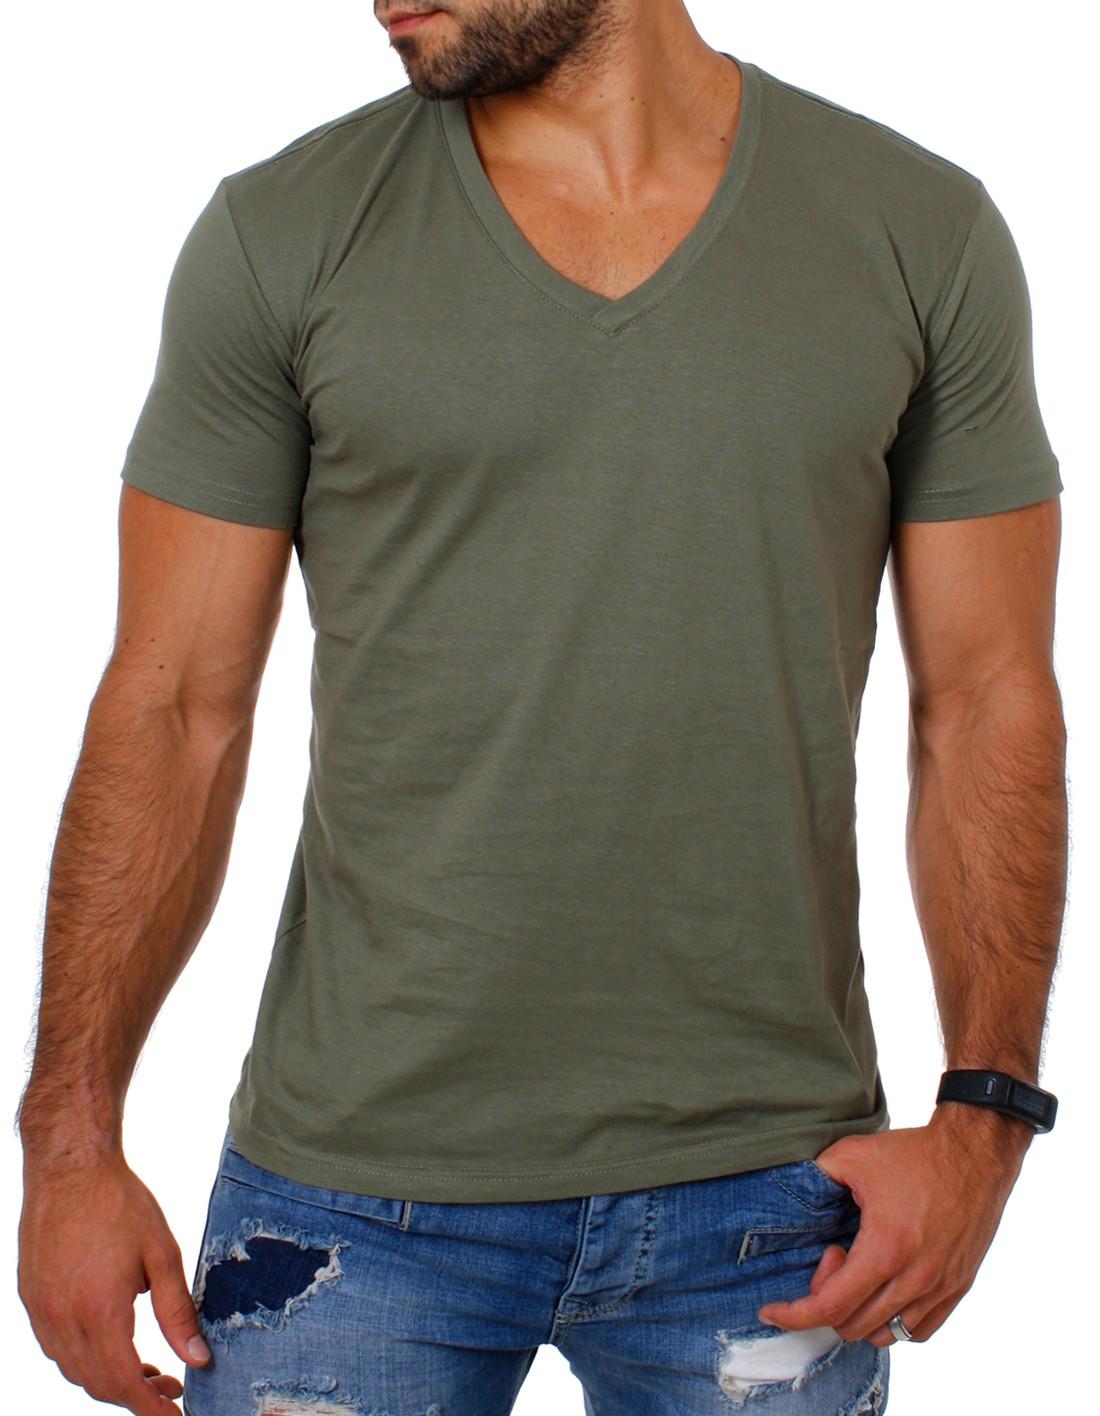 Young-amp-Rich-Uni-Basic-T-Shirt-tiefer-V-Ausschnitt-einfarbig-fuer-Herren-Maenner